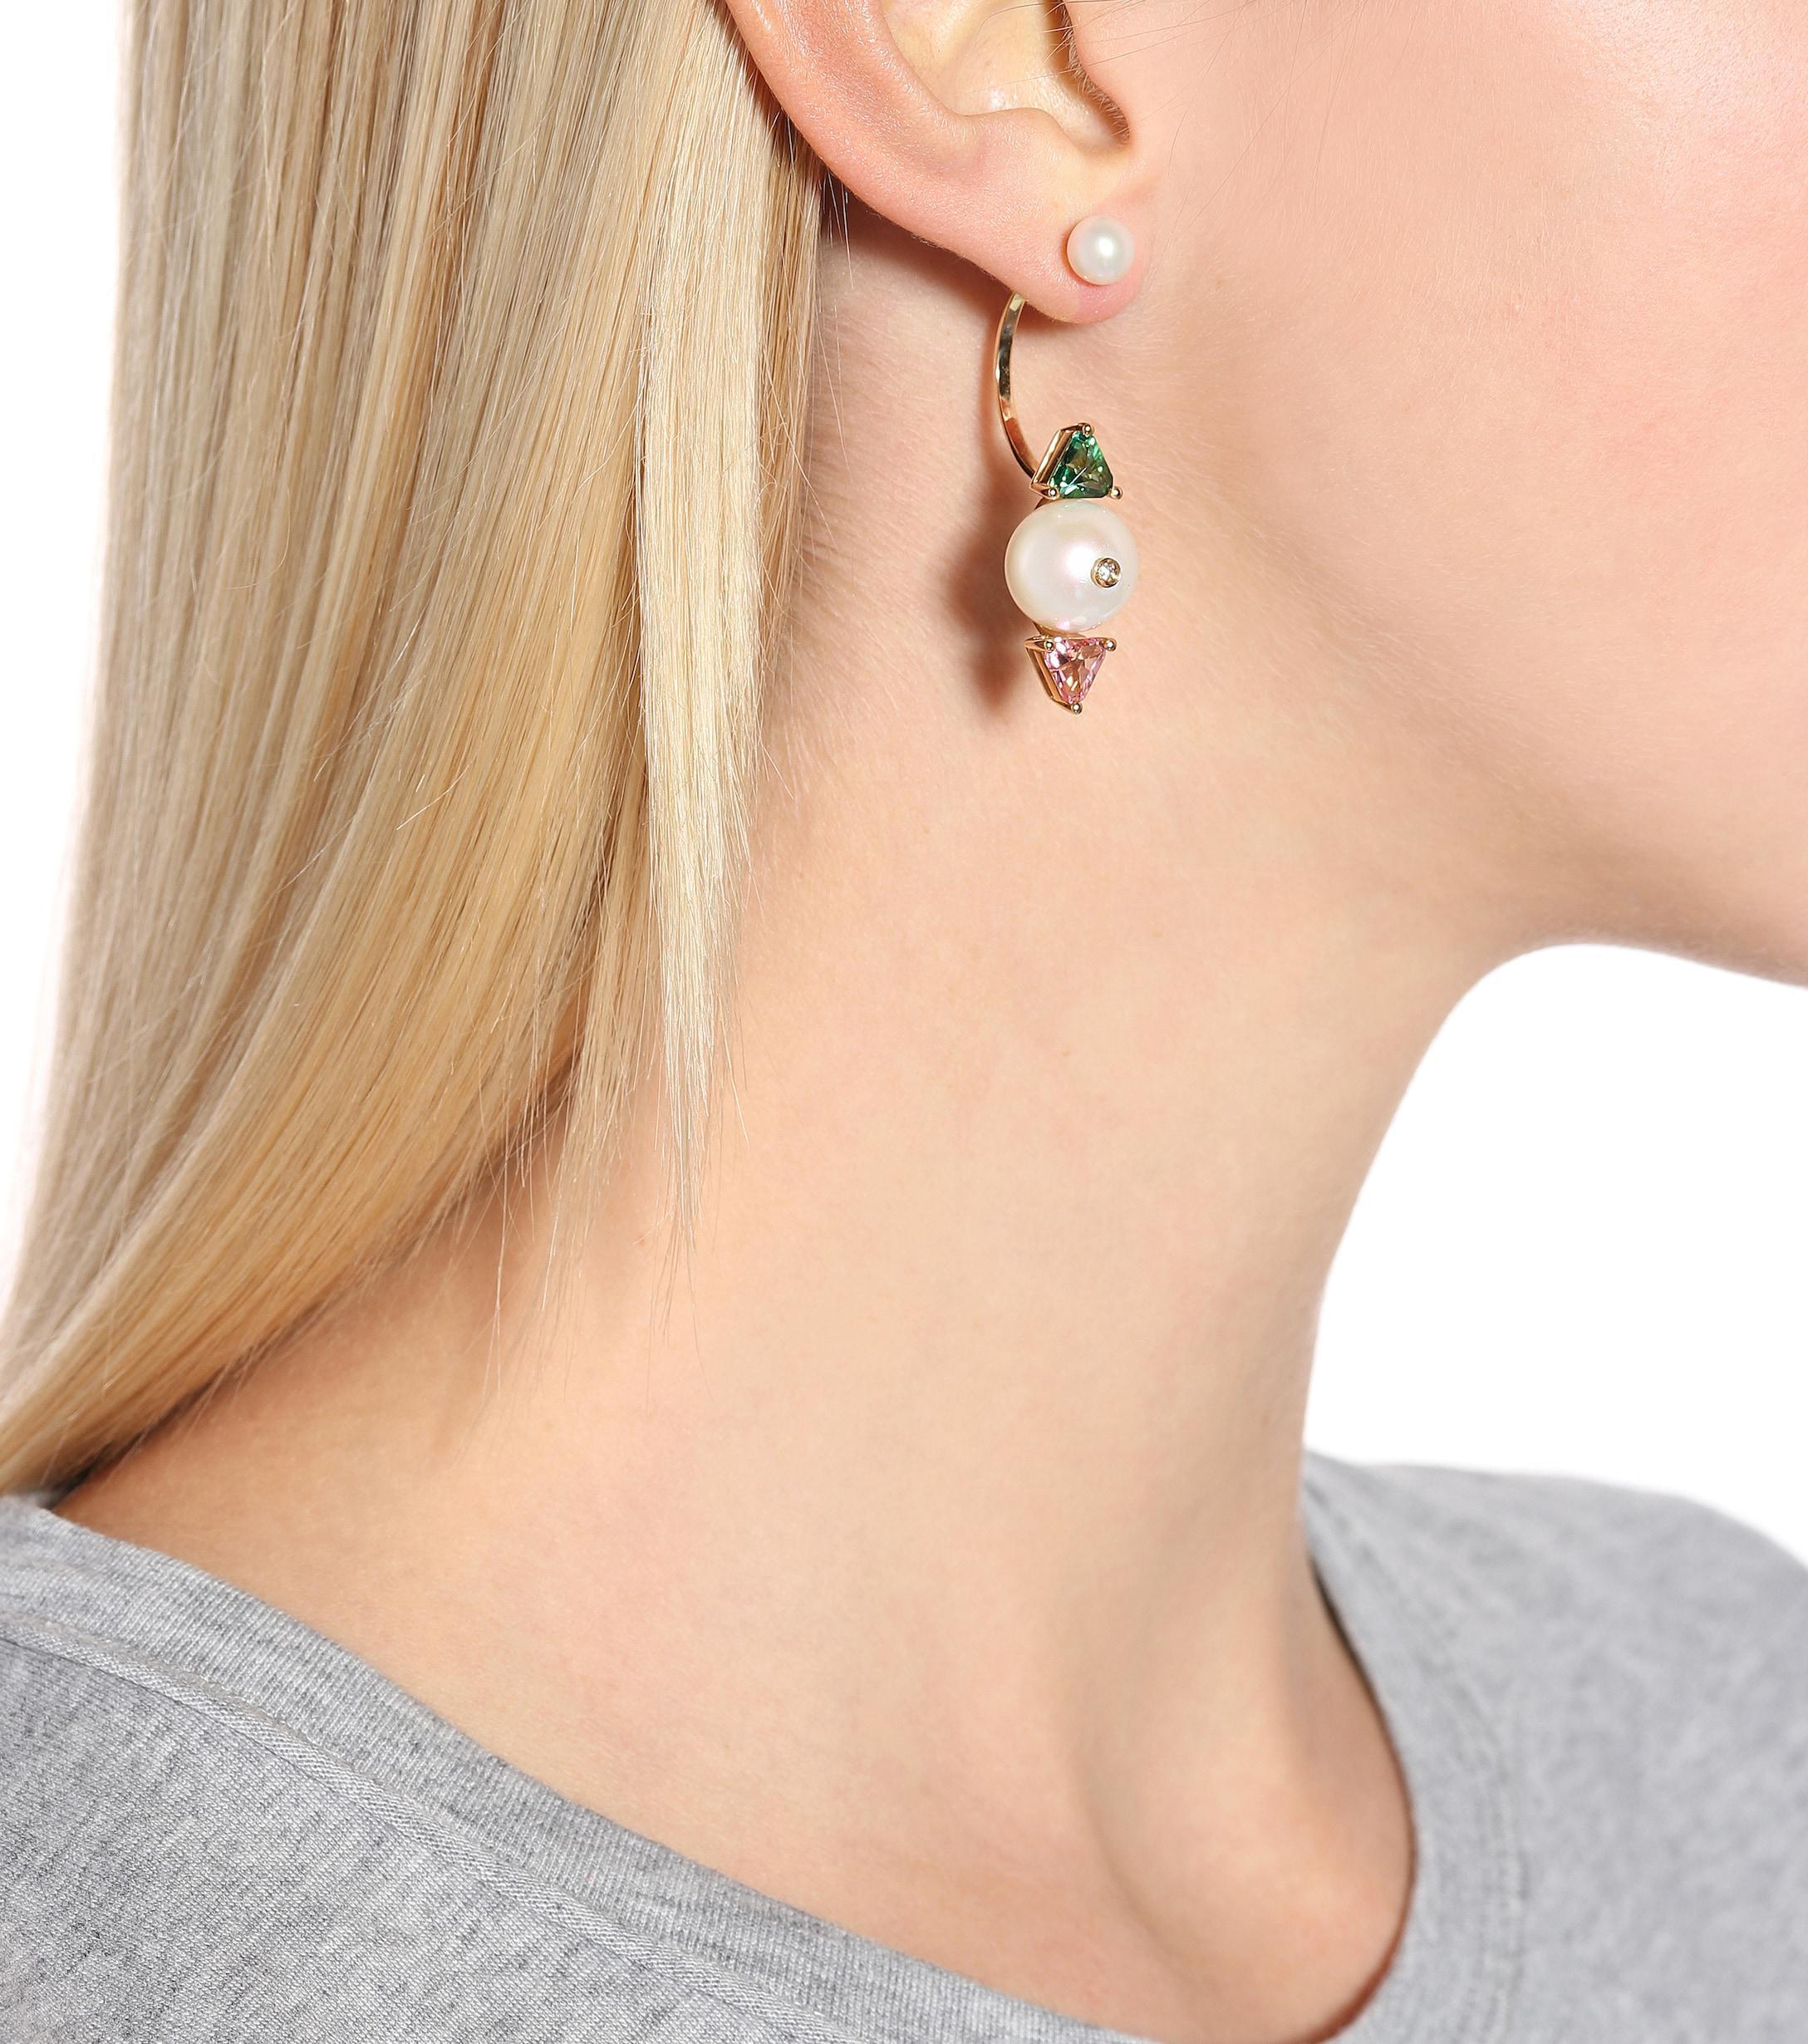 Delfina Delettrez Complex Gemetries 18kt Gold Earring With Topaz, Diamond And Pearls in Metallic